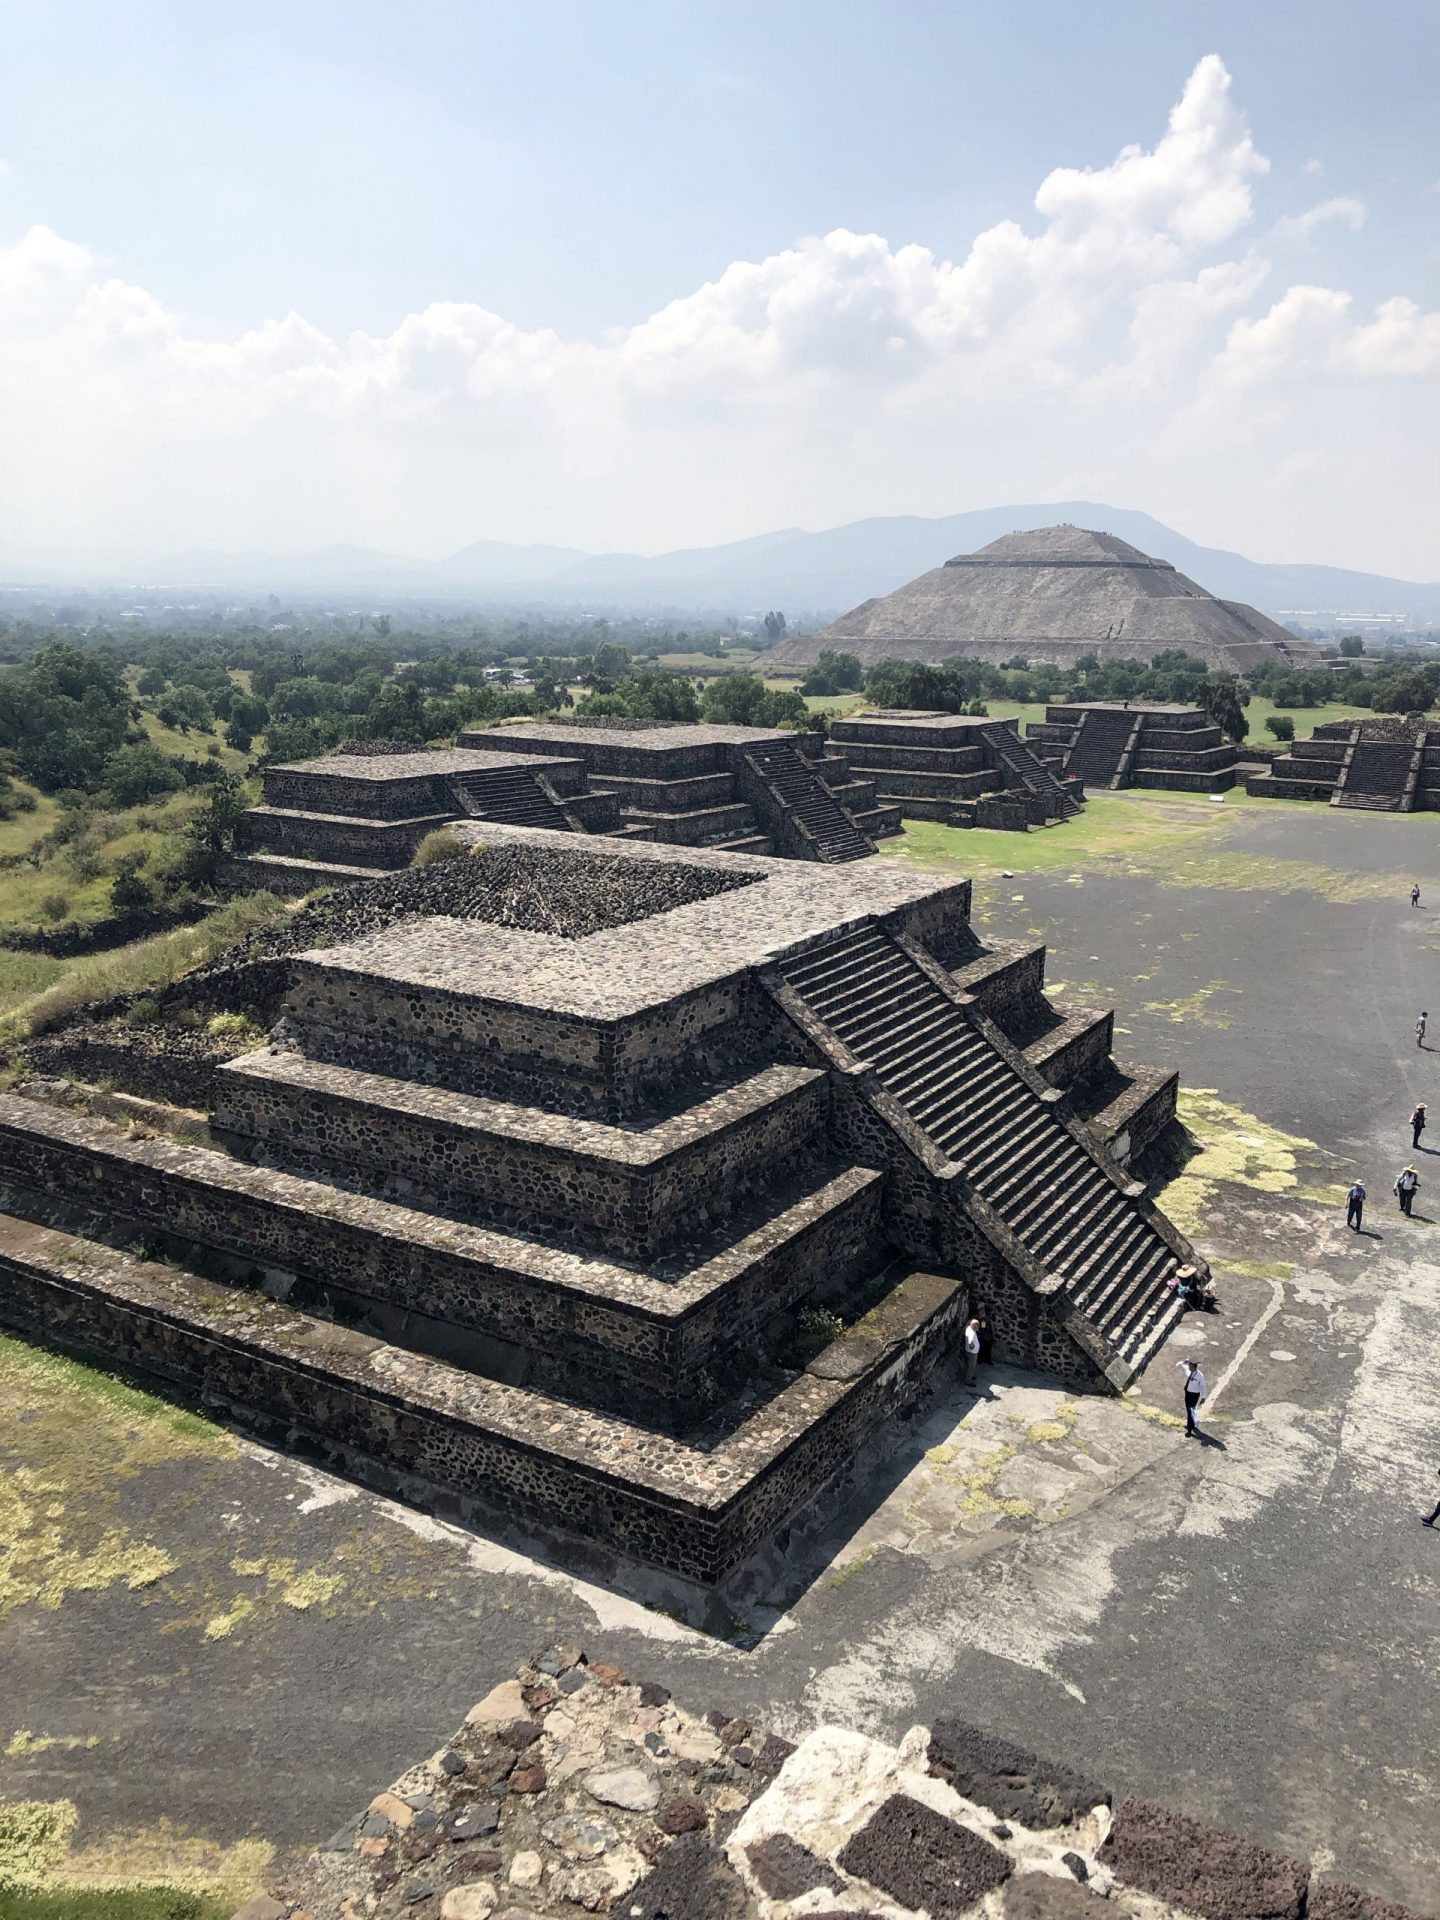 Mexico City, Mexico: 19.4326° N, 99.1332° W